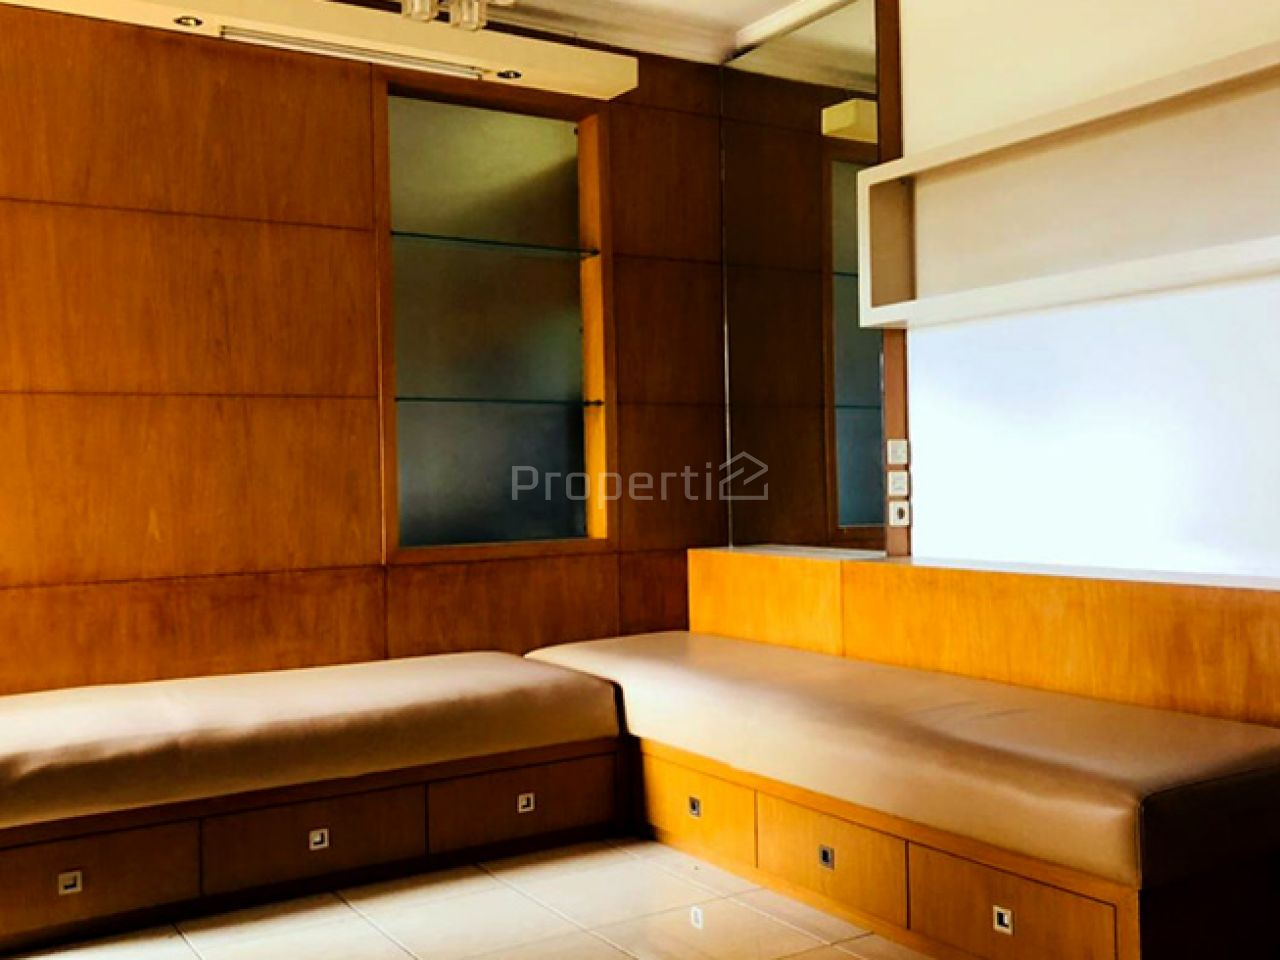 3BR Apartment Unit at Grand Setiabudi, 17th Floor, Jawa Barat